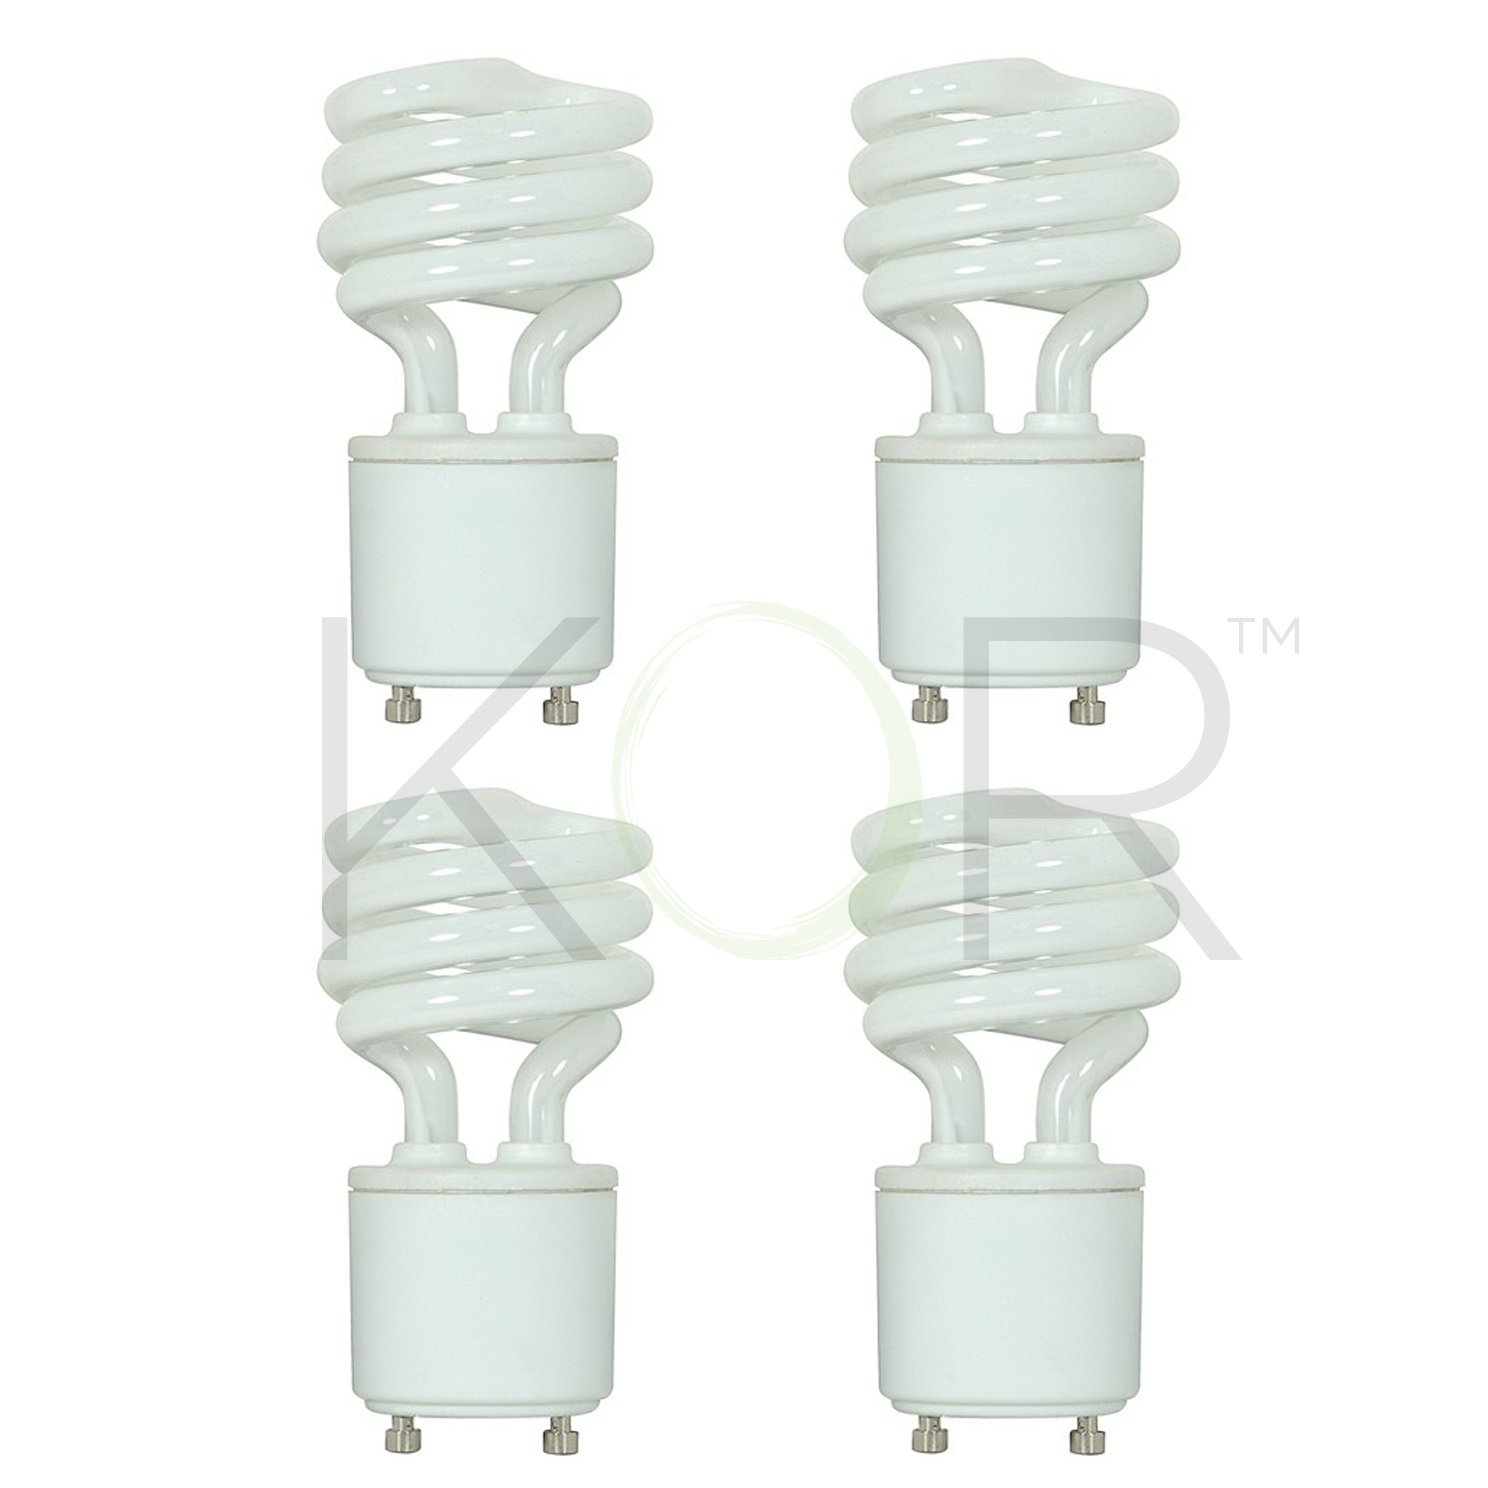 (4 Pack) 13 Watt Mini Spiral - GU24 Base - (60W Equivalent) - T2 Mini-Twist - CFL Light Bulb - 2700K Warm White